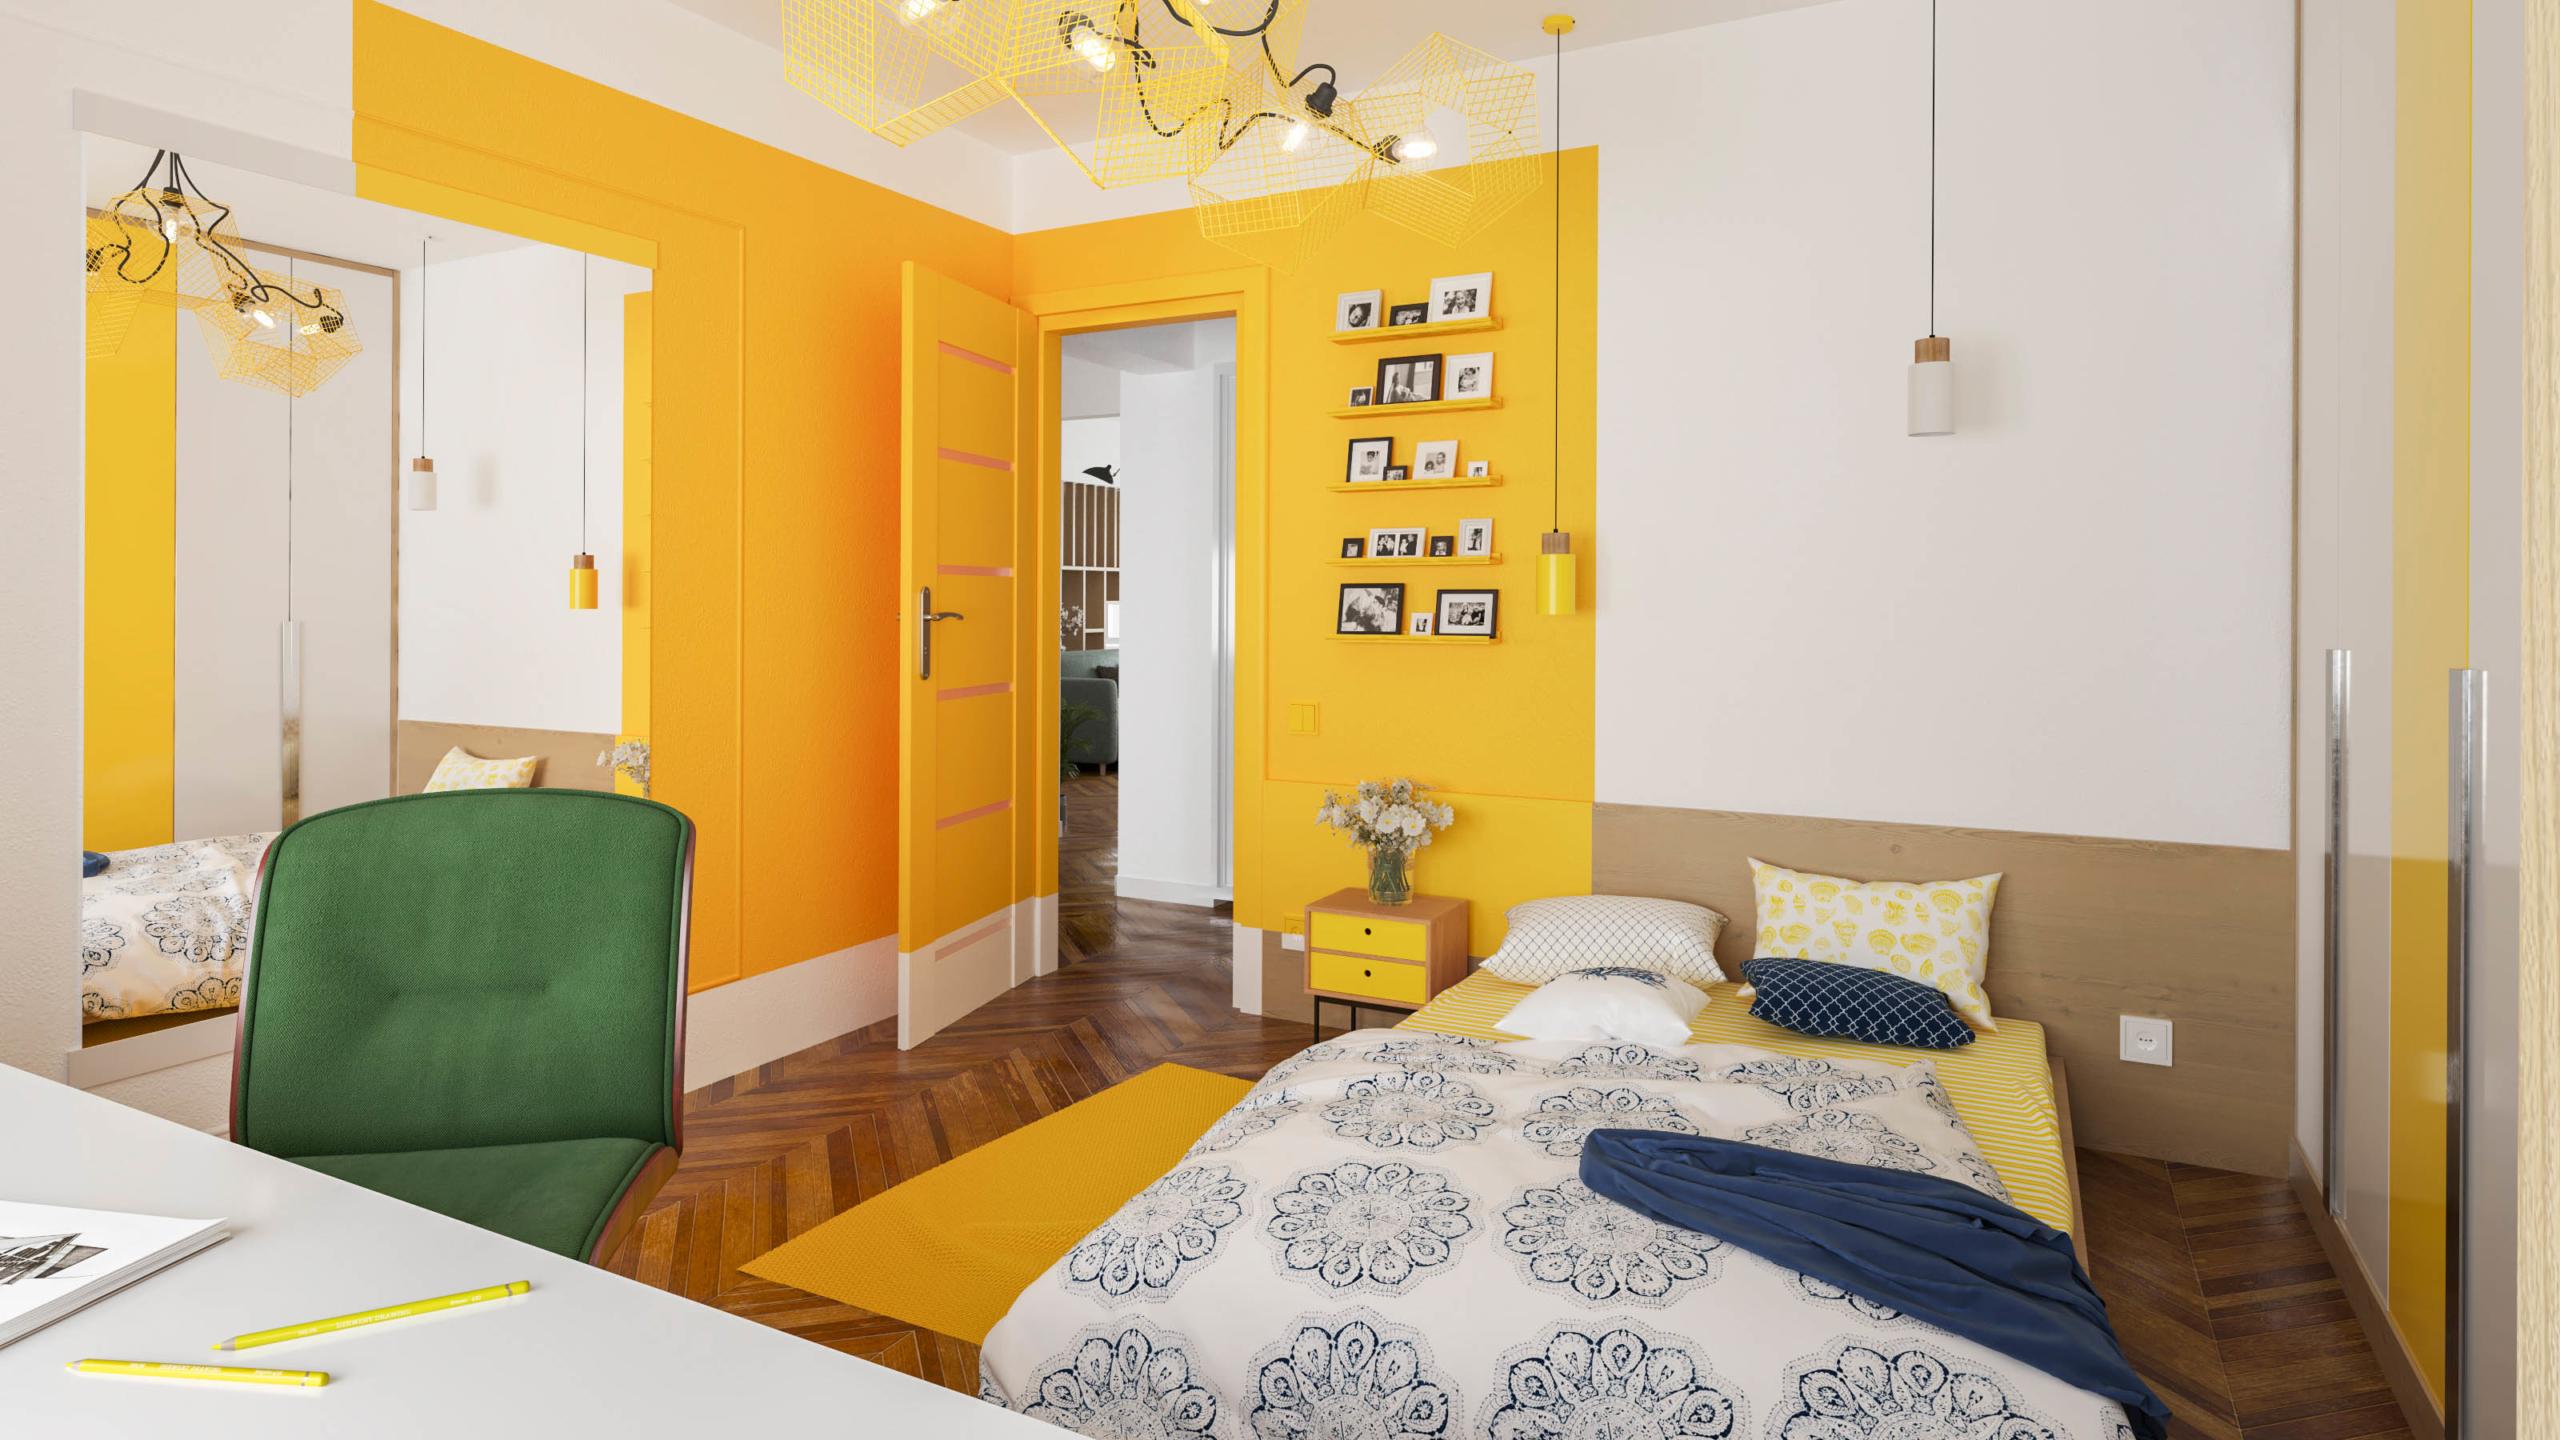 caojdan_four_room_flat